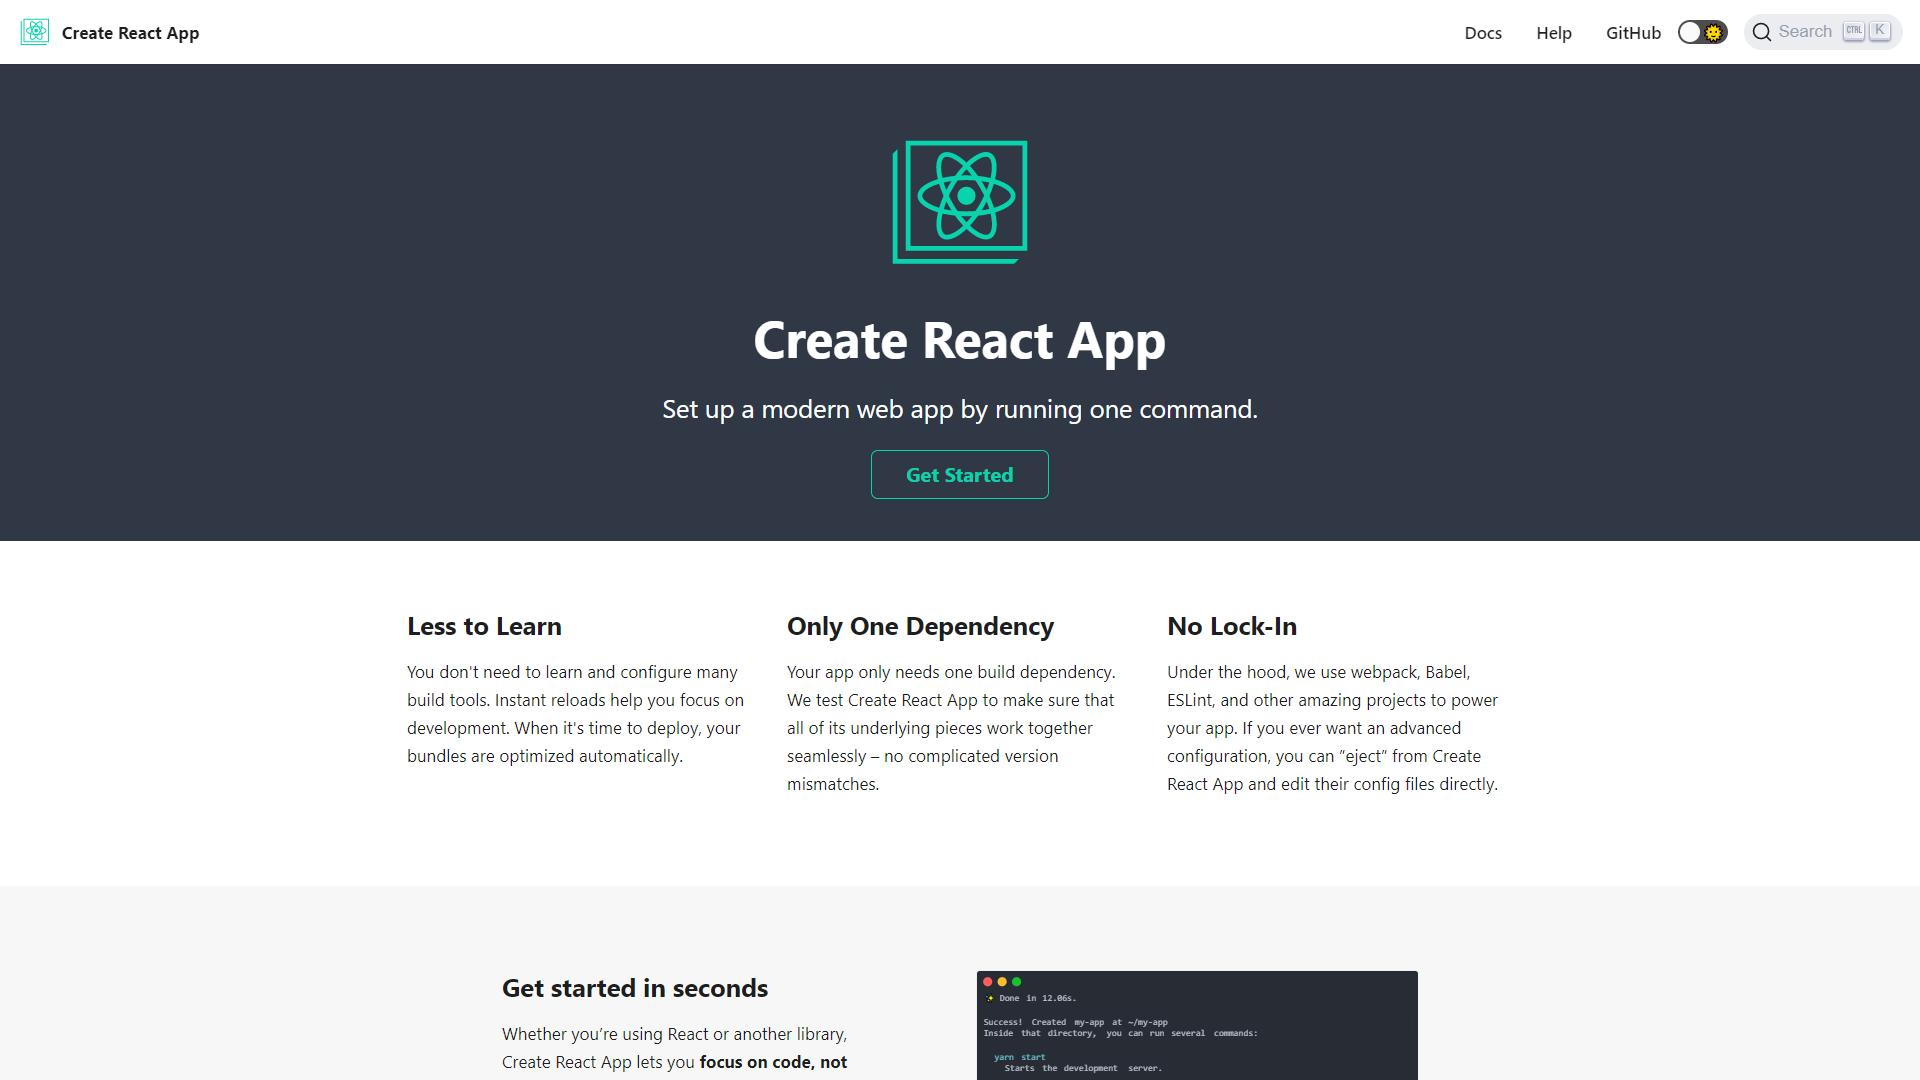 creat React